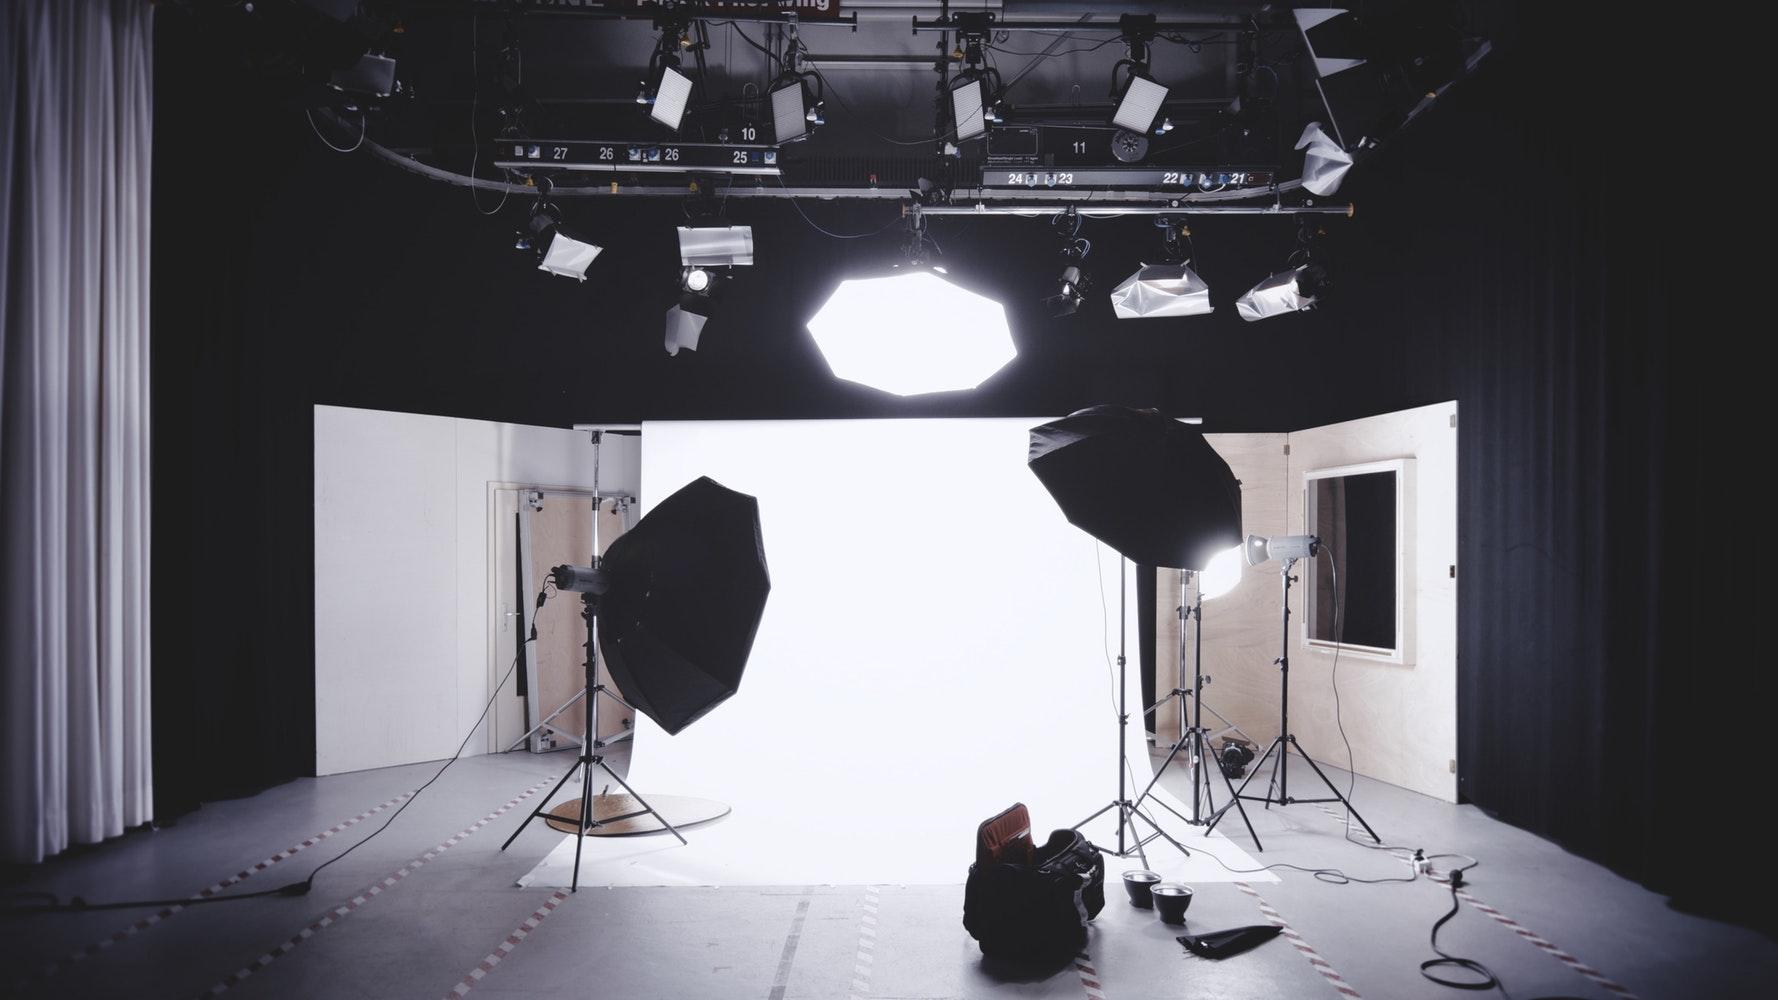 New England Video Production studio